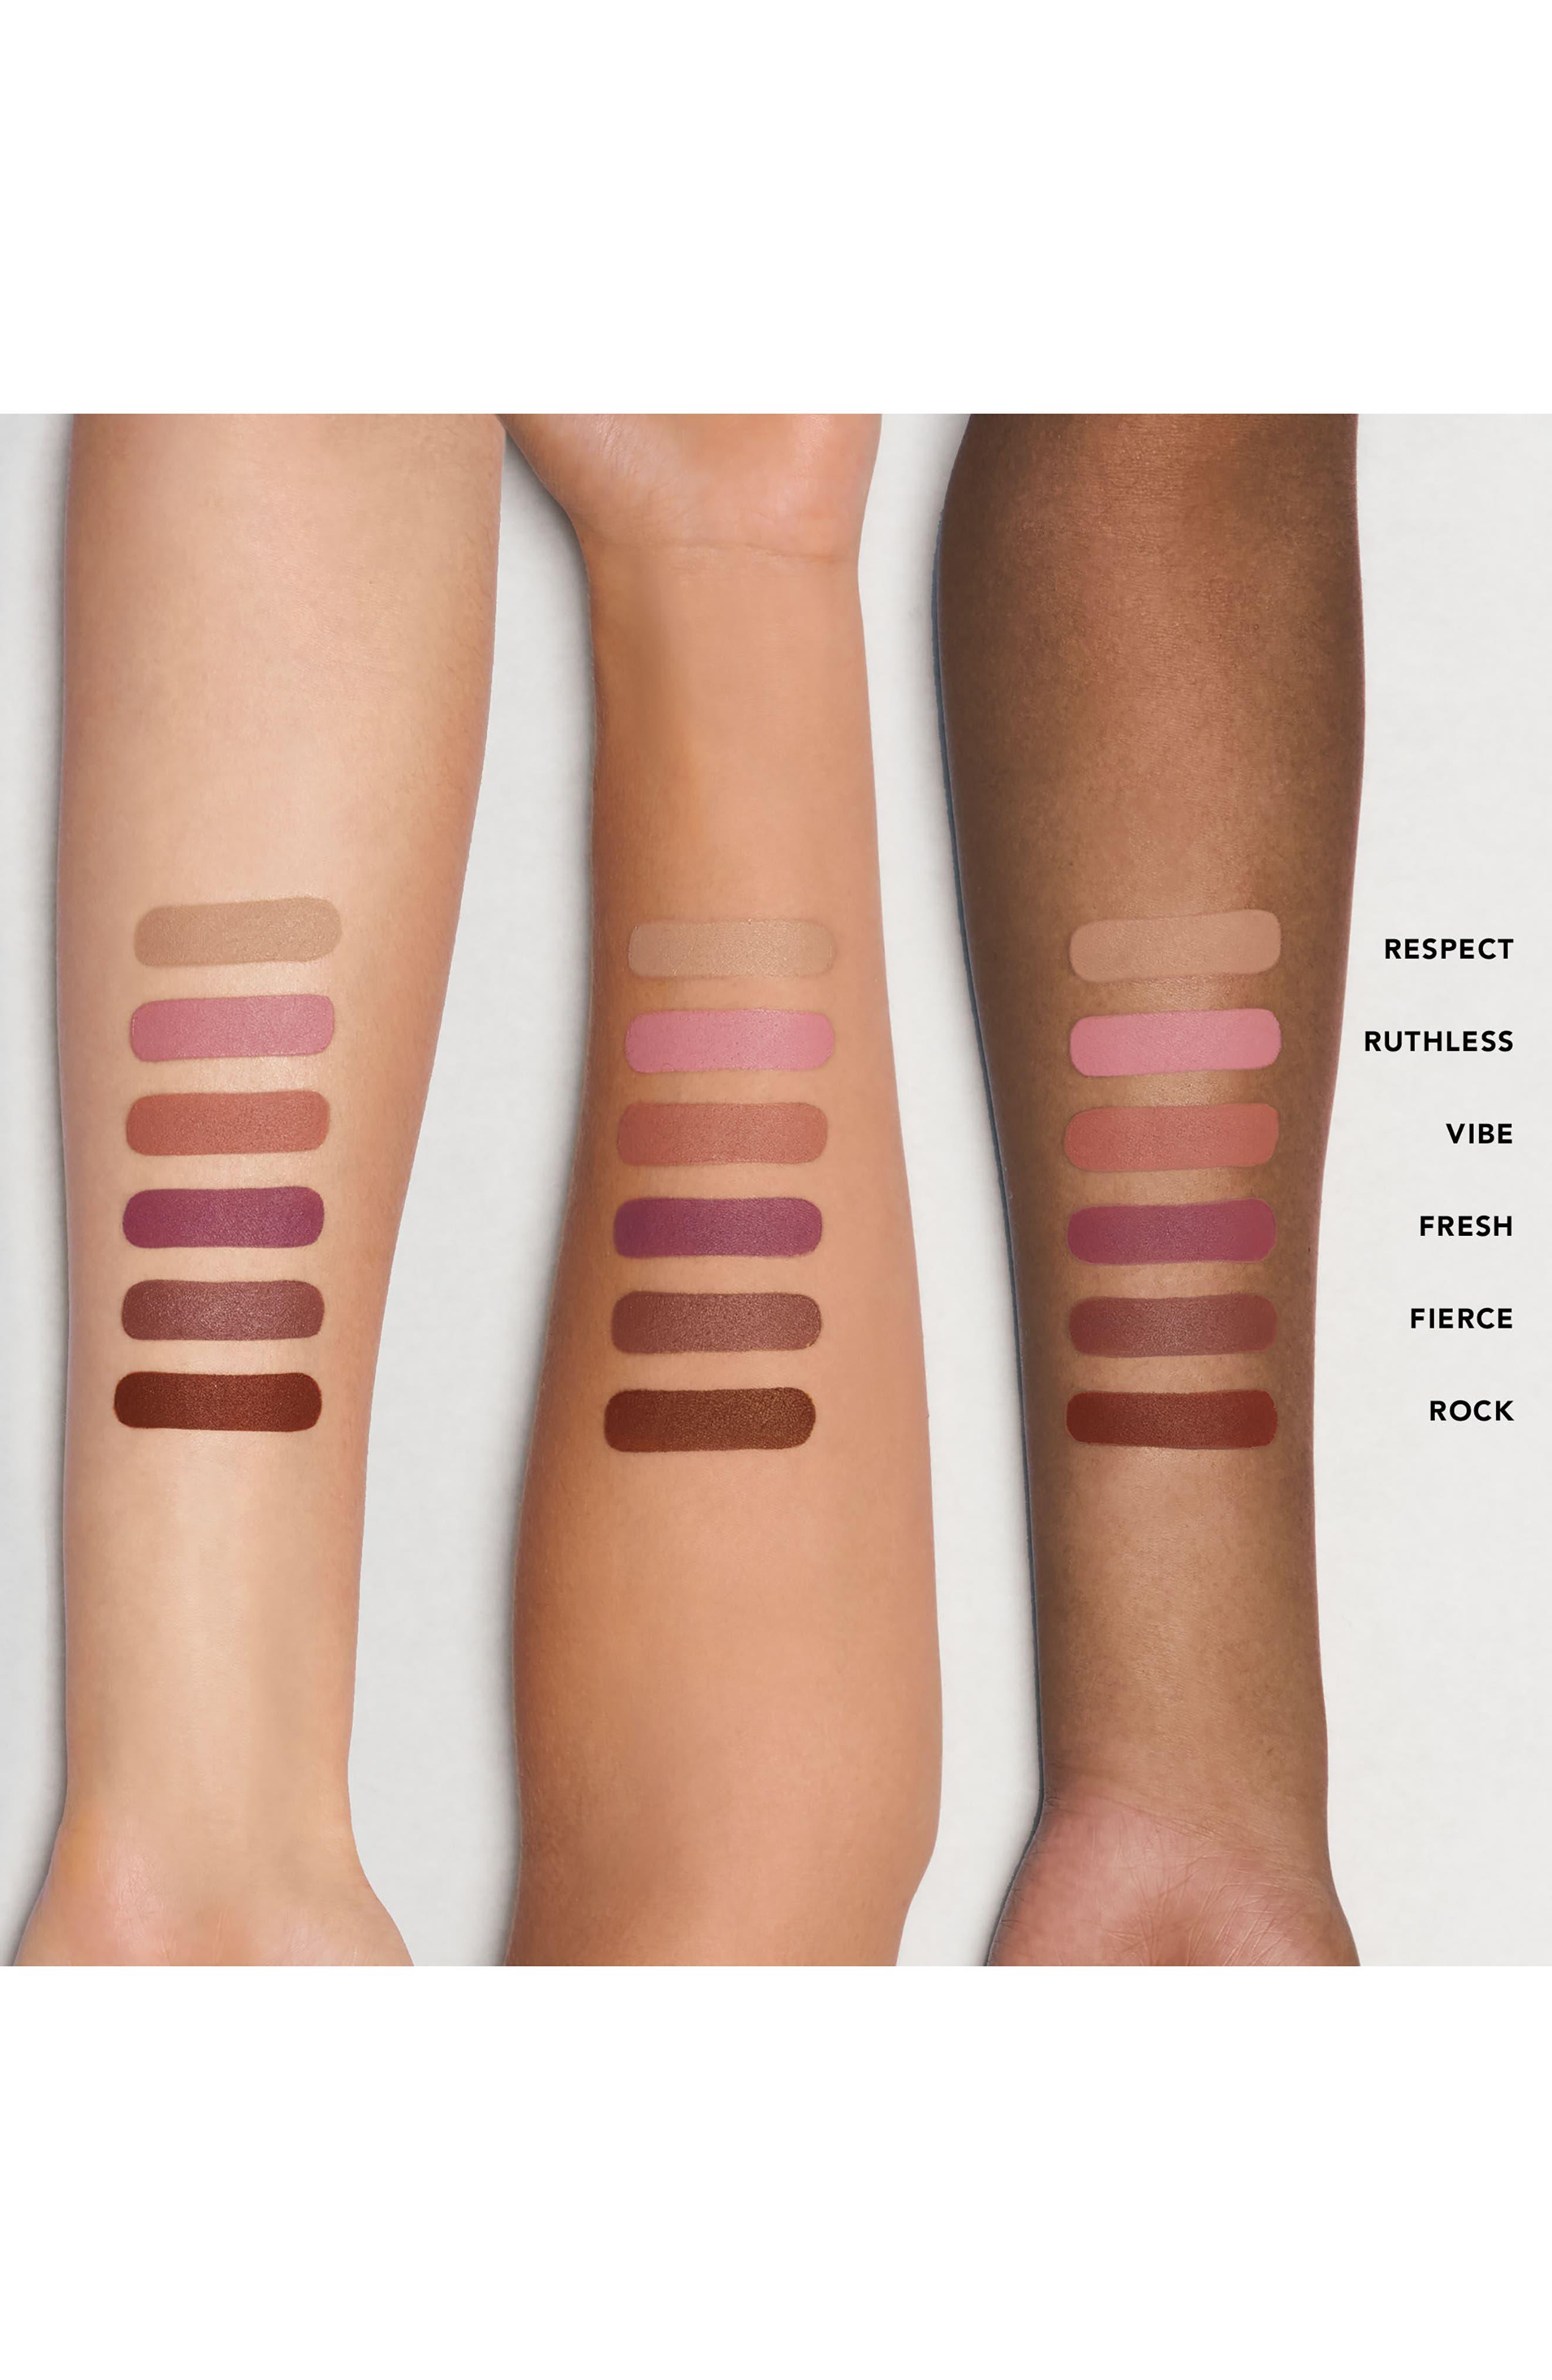 Velour Extreme Matte Lipstick,                             Alternate thumbnail 5, color,                             ROCK